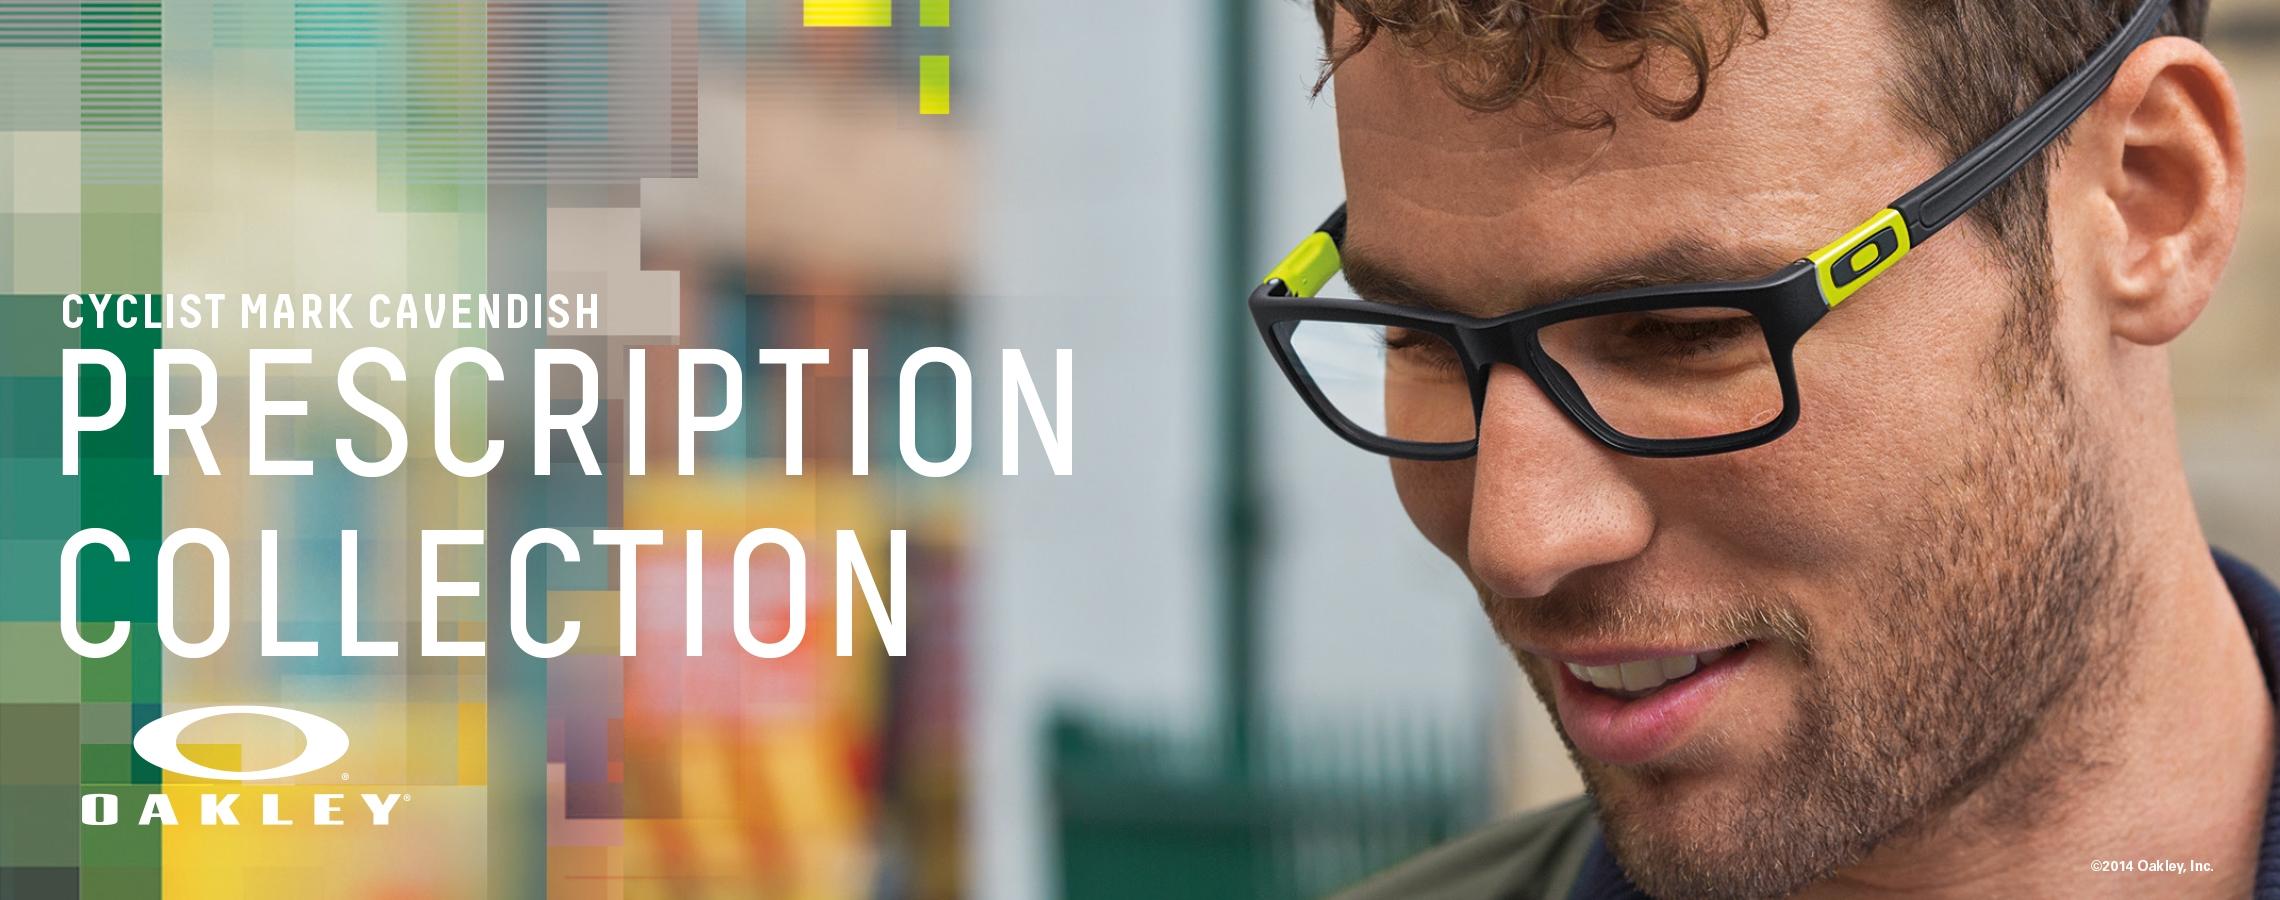 cd93ffabe7b Mark Cavendish Wears Oakley Prescription Glasses